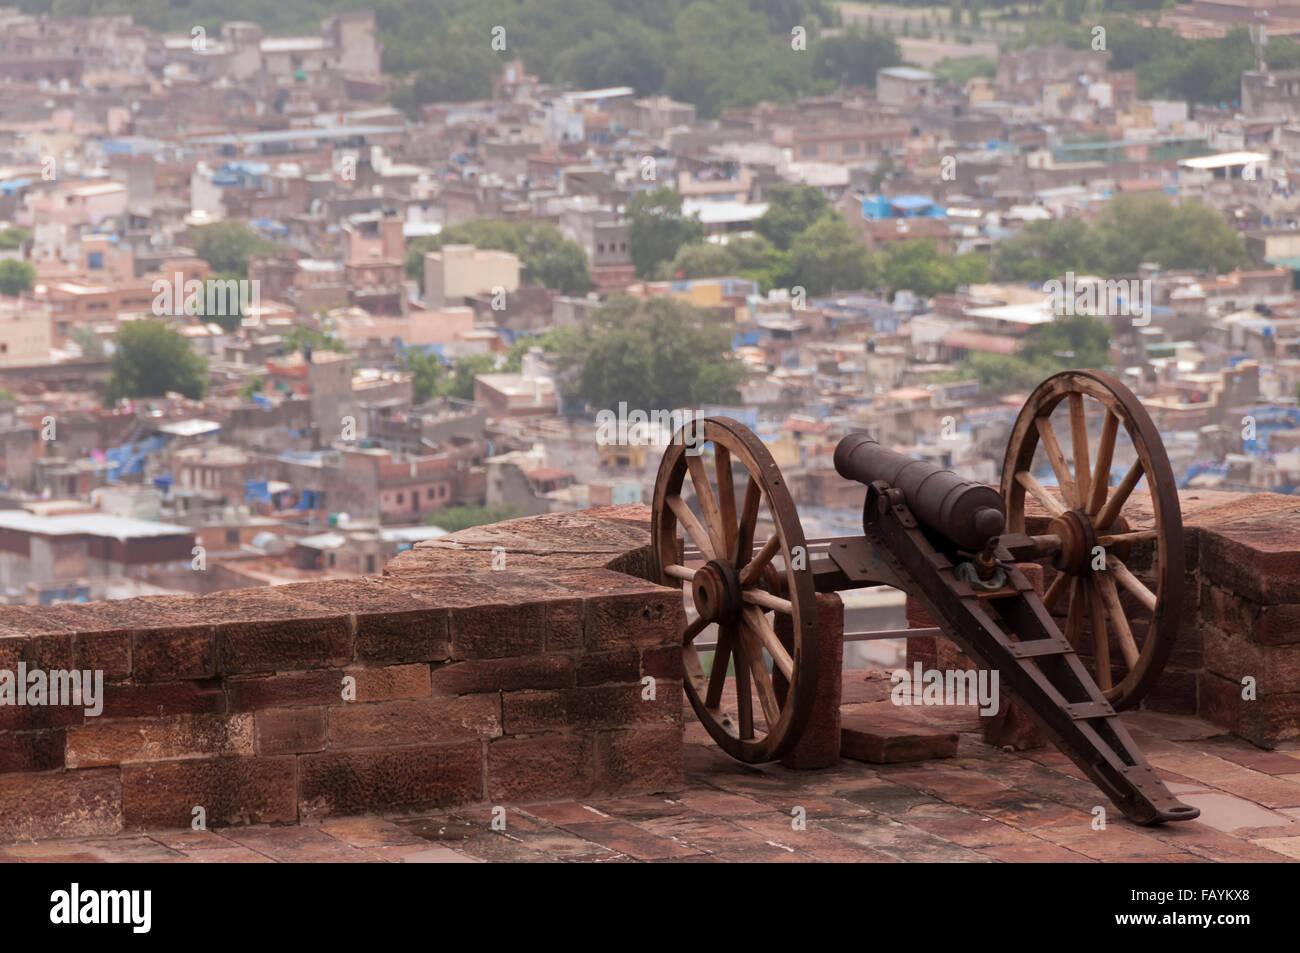 Old battle cannon at the Mehrangarh Fort, Jodhpur, India - Stock Image